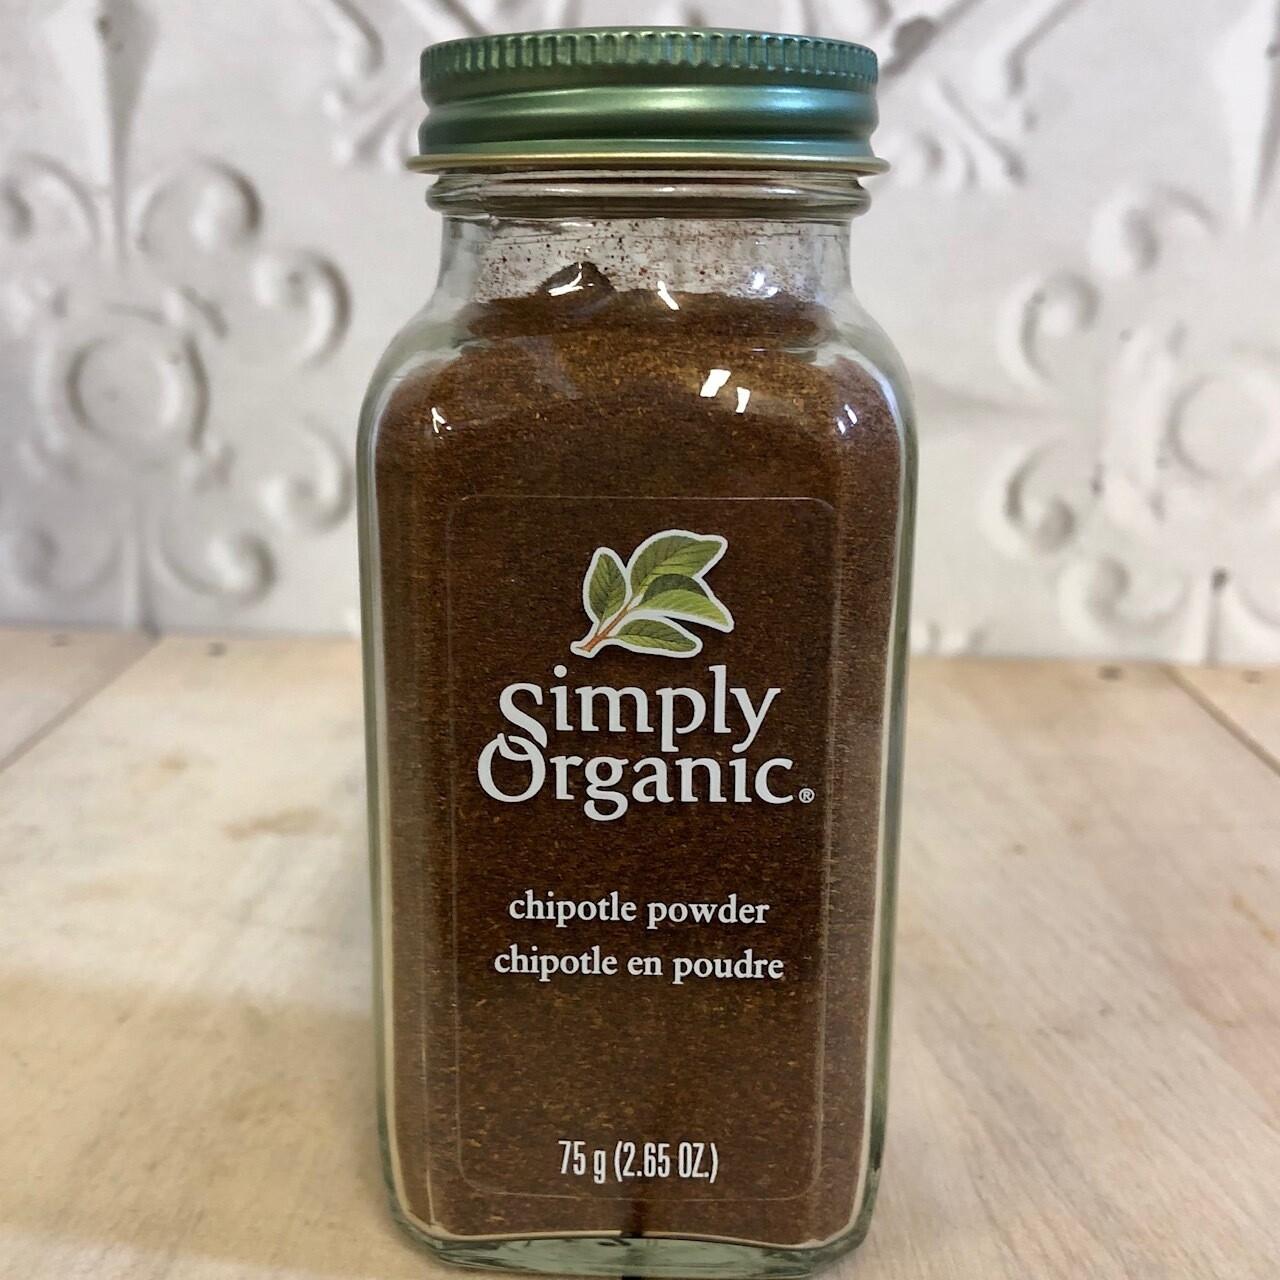 SIMPLY ORGANIC Chipotle Powder 75g